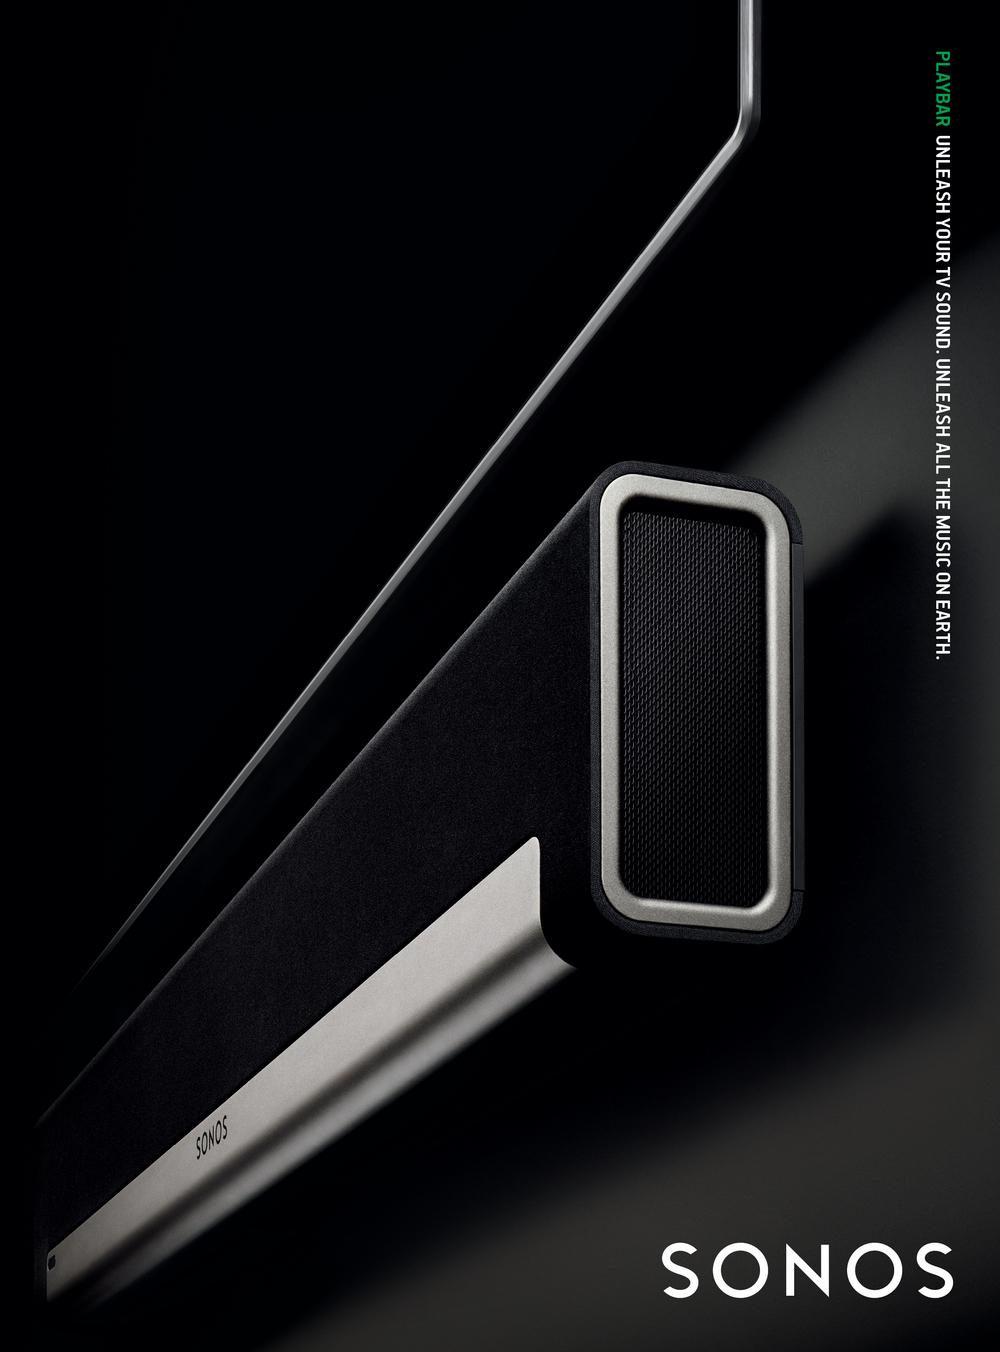 CE_Pro_Sonos_Playbar_SP_HR.jpg